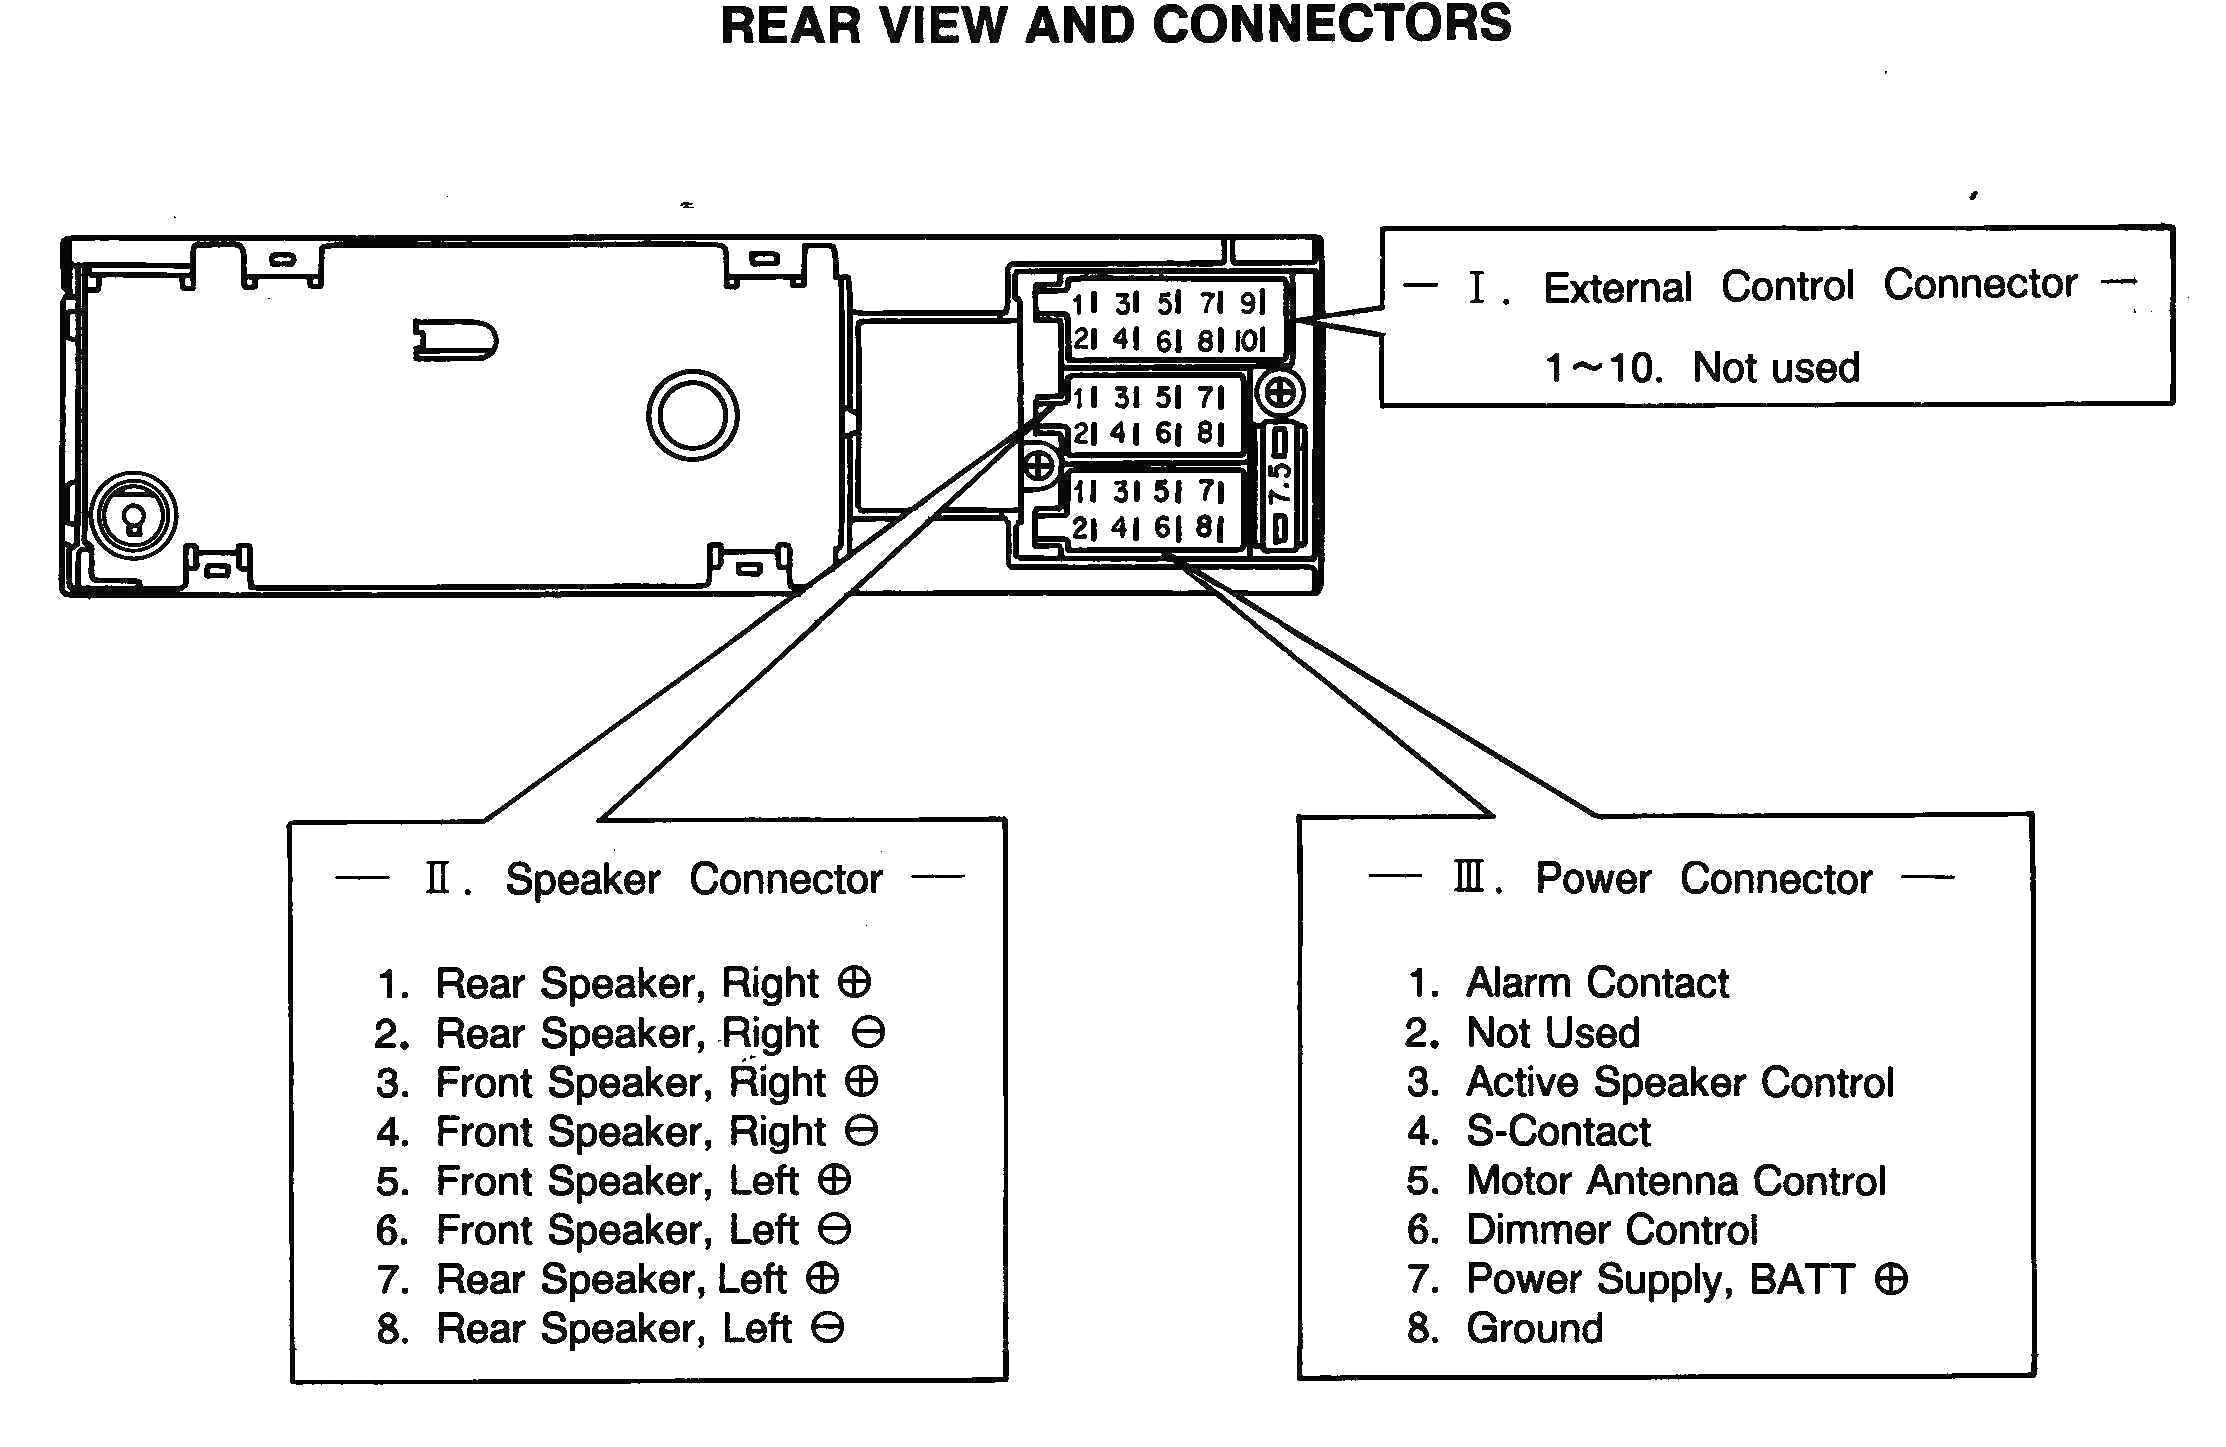 2006 Vw Jetta Radio Wiring Diagram Harley Davidson Radio Wiring Diagram Wiring Diagram Of 2006 Vw Jetta Radio Wiring Diagram